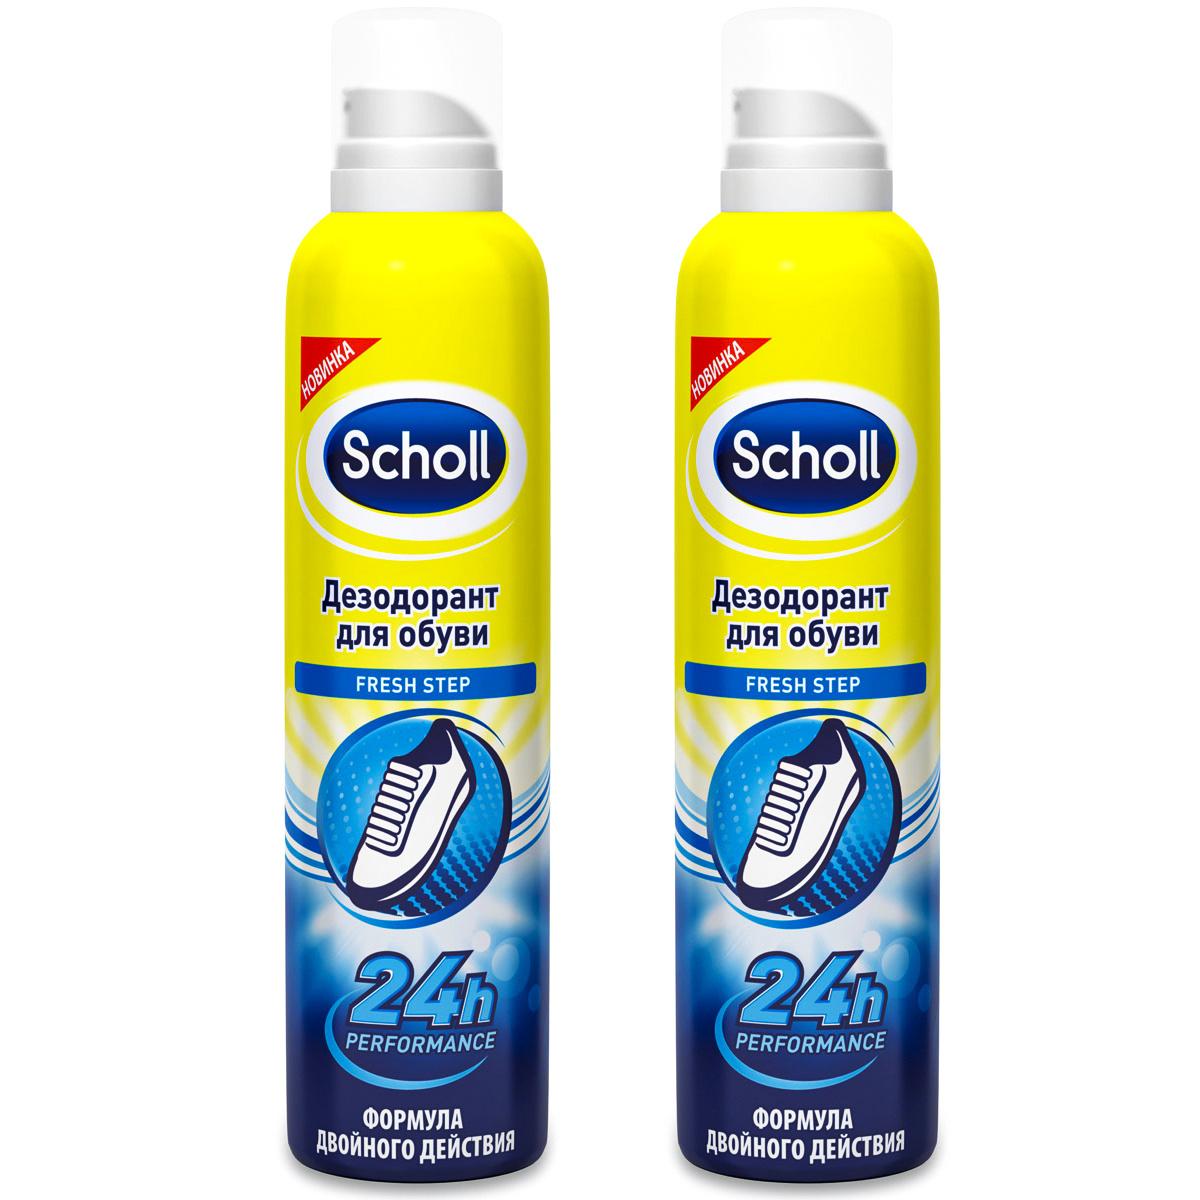 Дезодорант для обуви Scholl, 150 мл, 2 шт #1